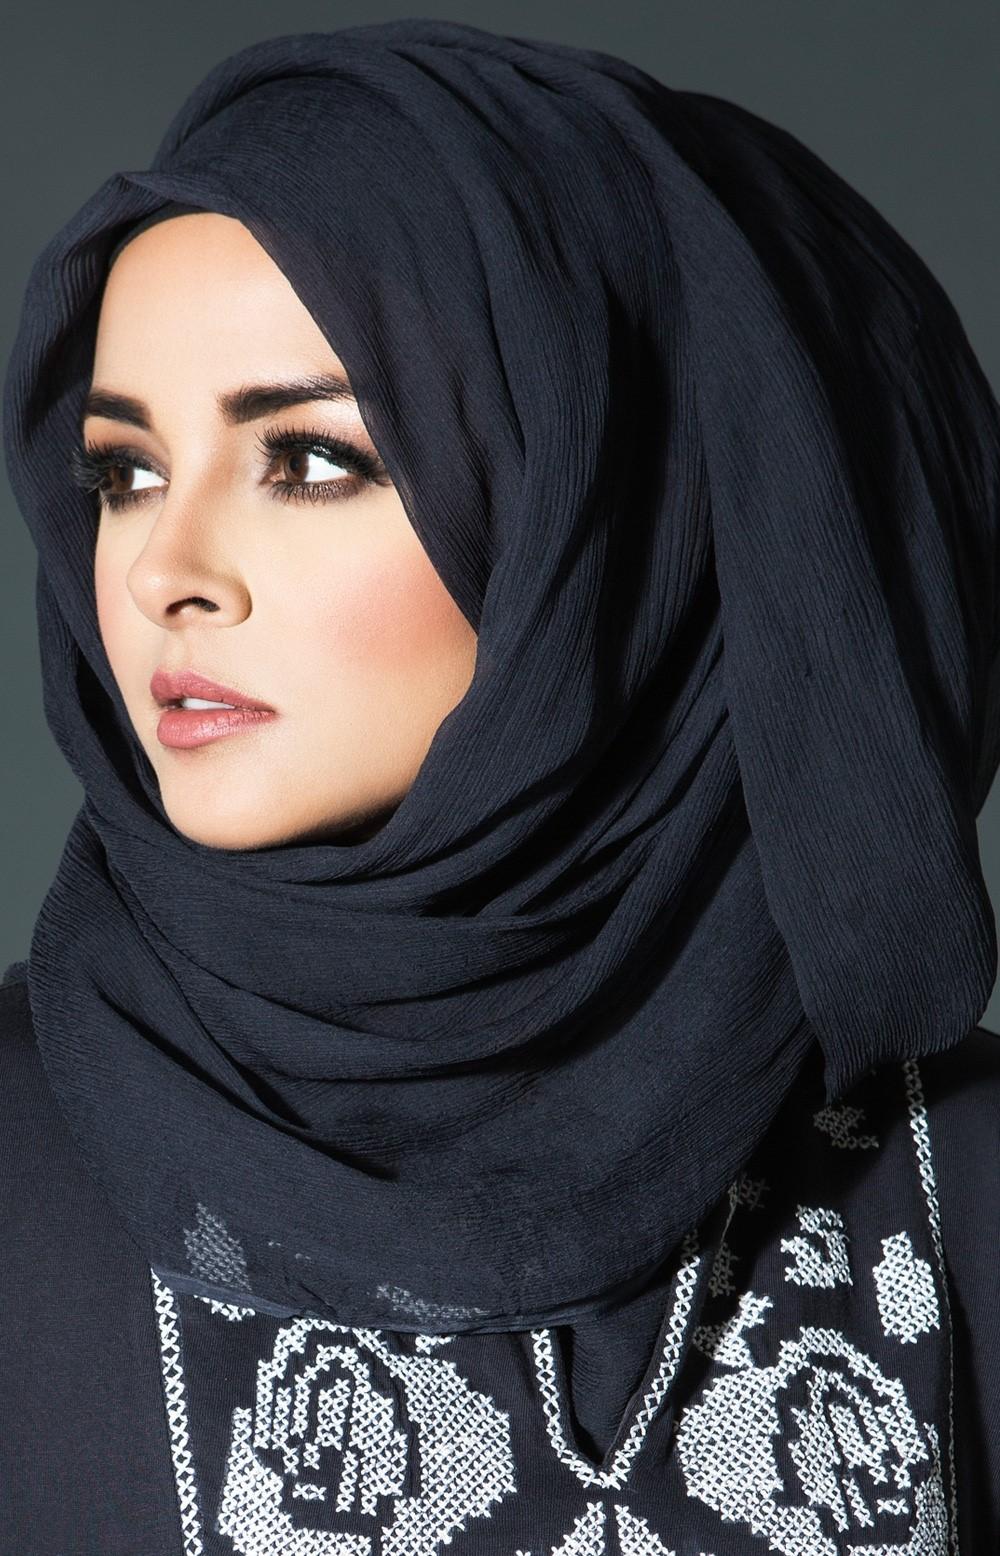 Mujeres arabes con burka